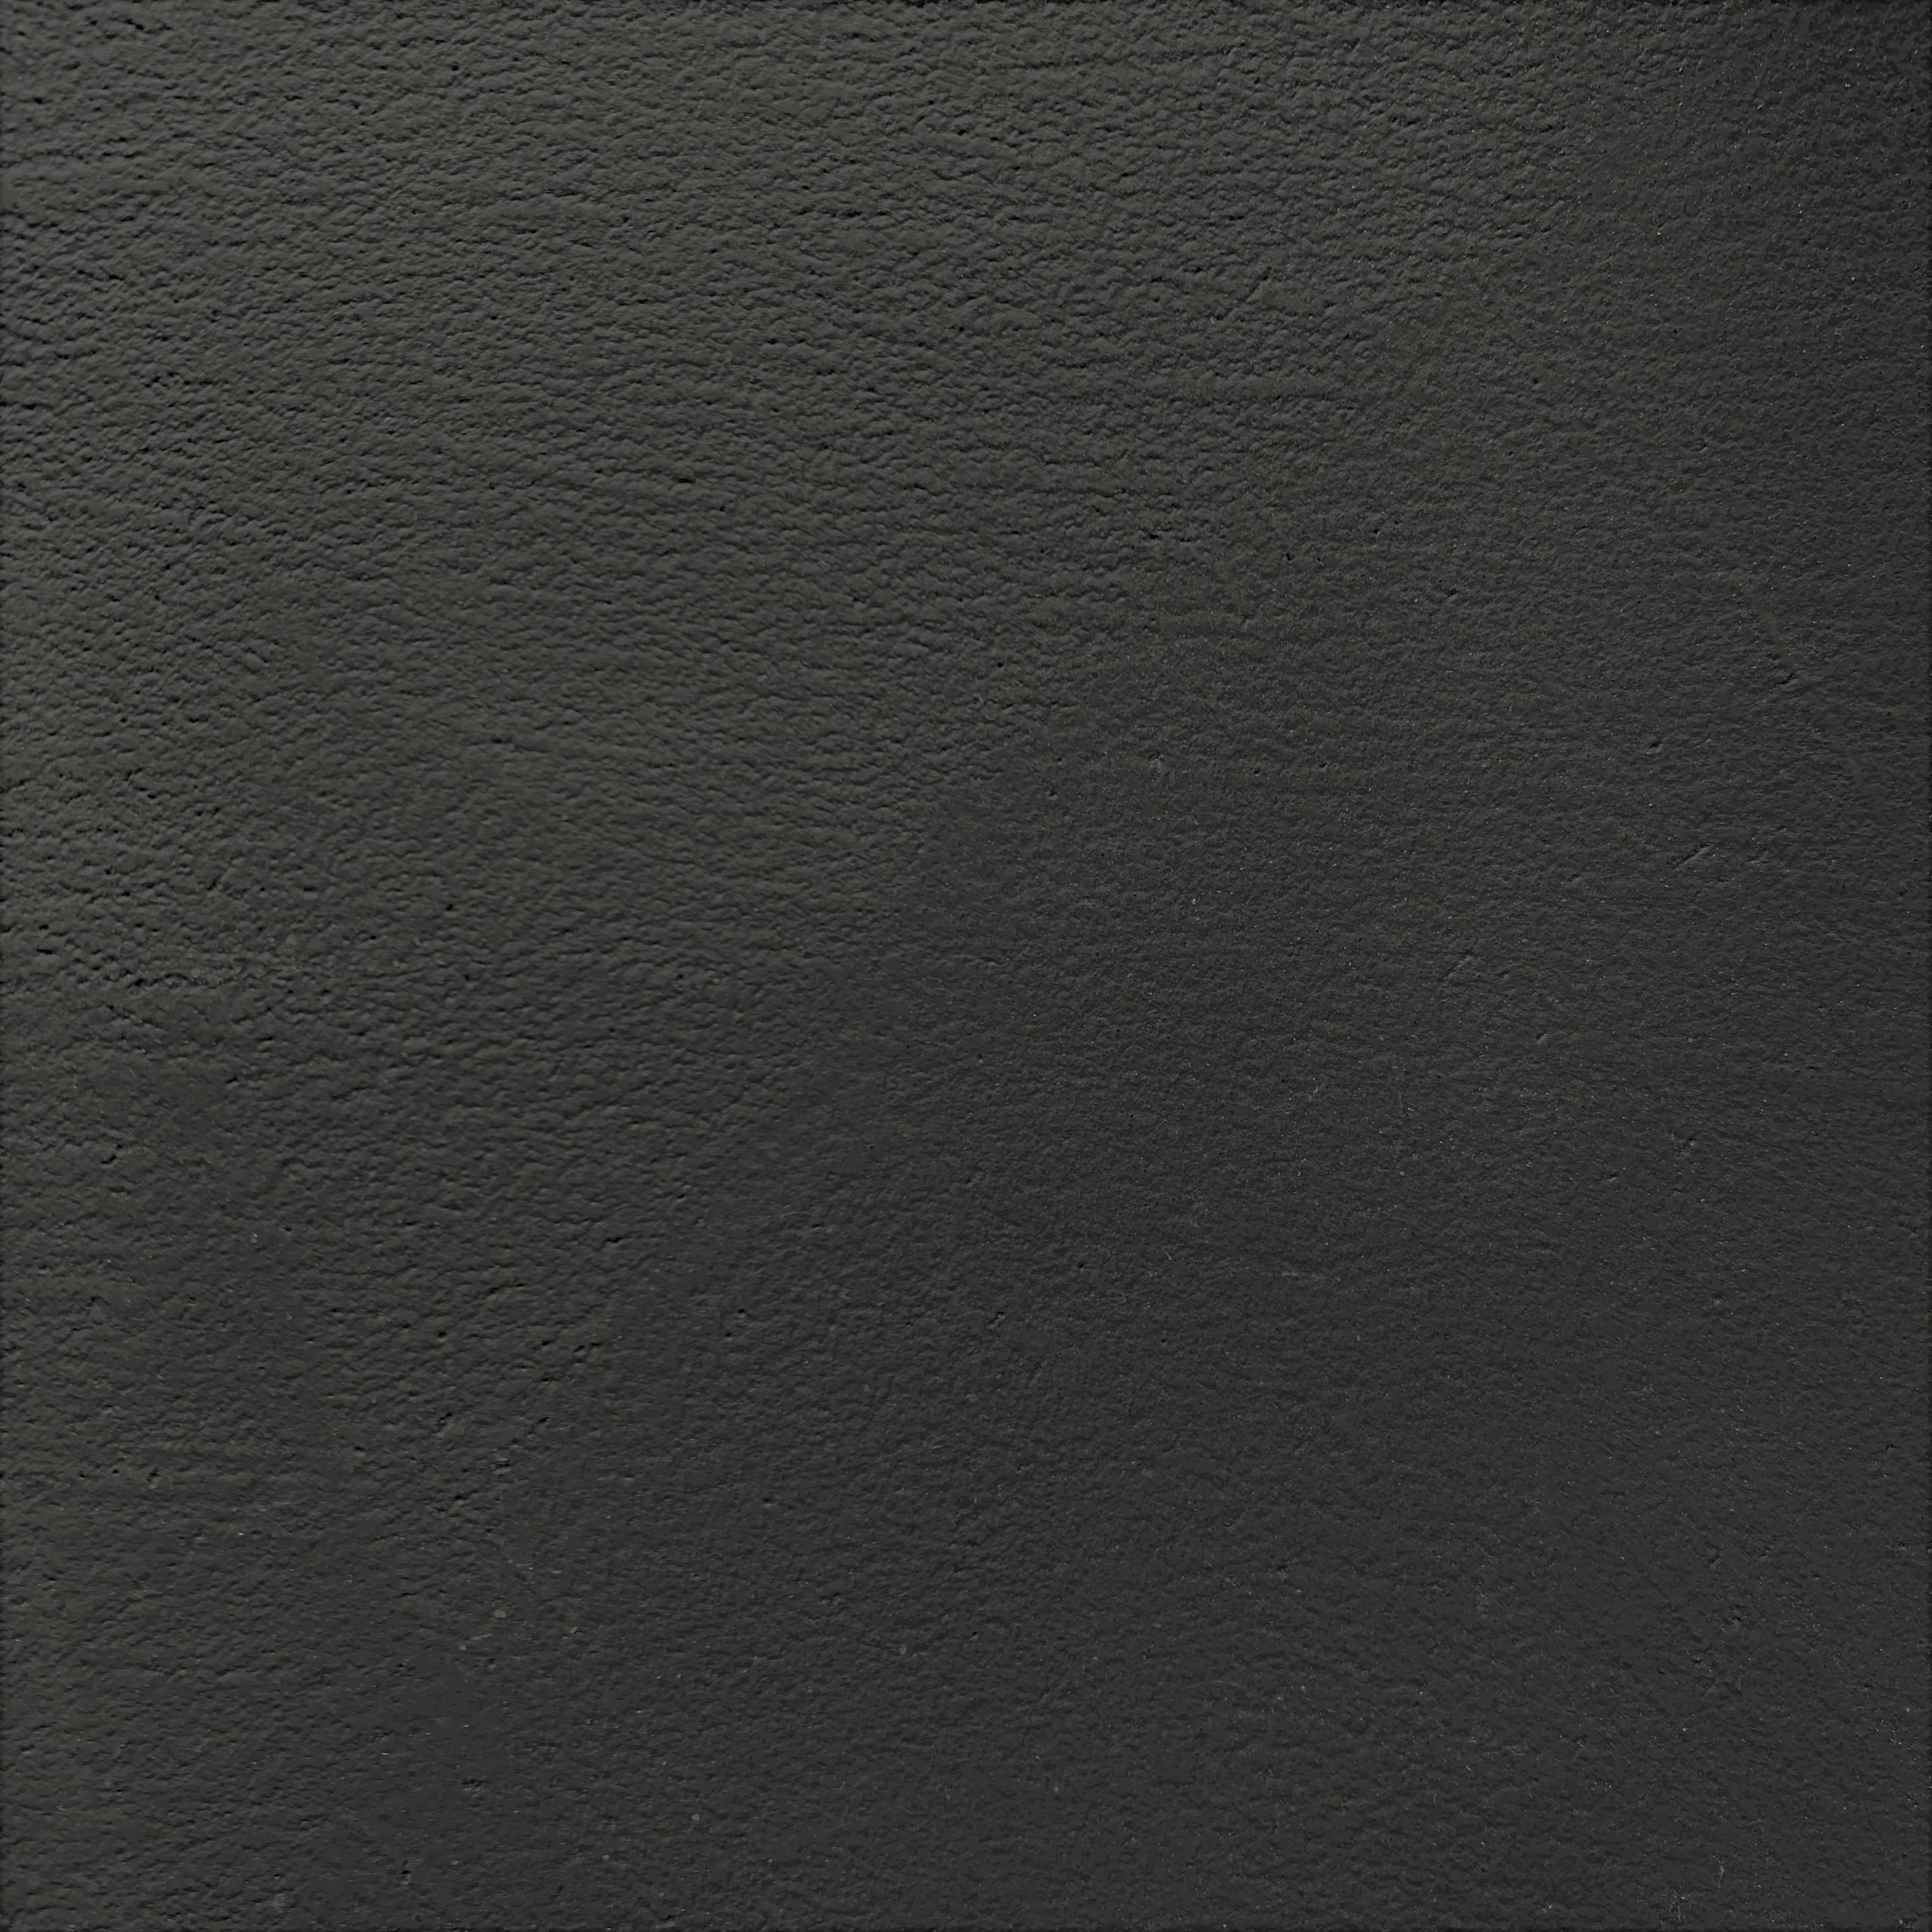 10-35 Steel Black